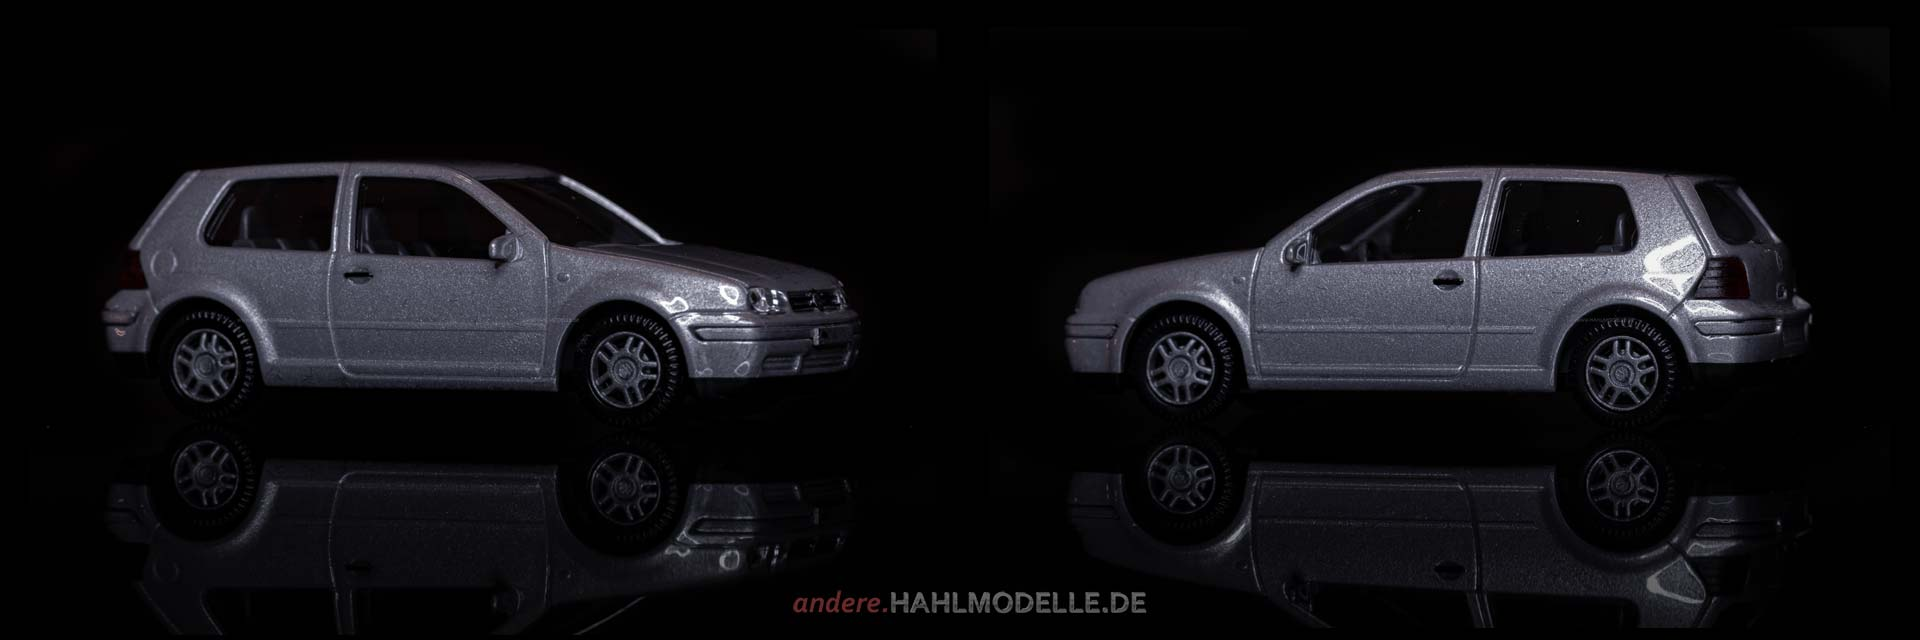 Volkswagen Golf IV | Limousine (Typ 1J) | Wiking | 1:87 | www.andere.hahlmodelle.de